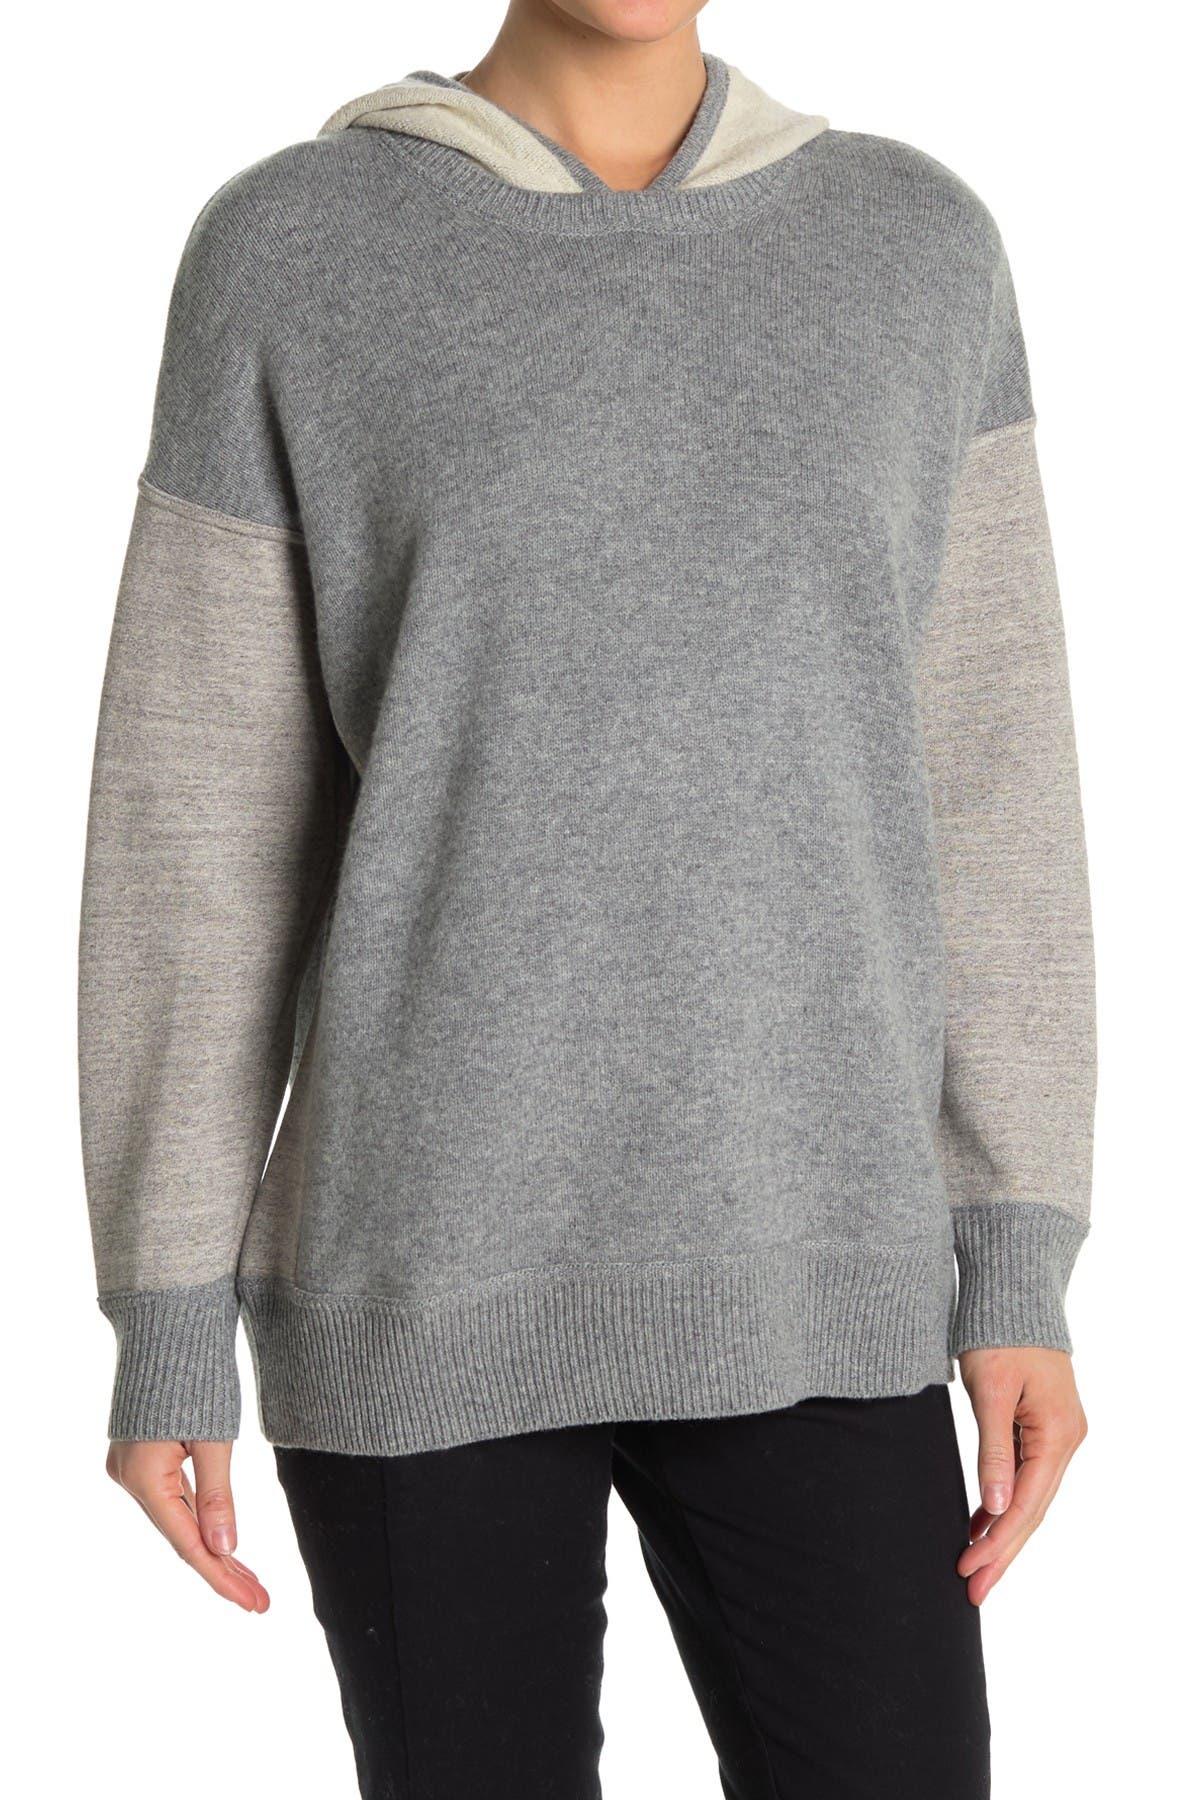 Image of James Perse Contrast Hooded Sweatshirt